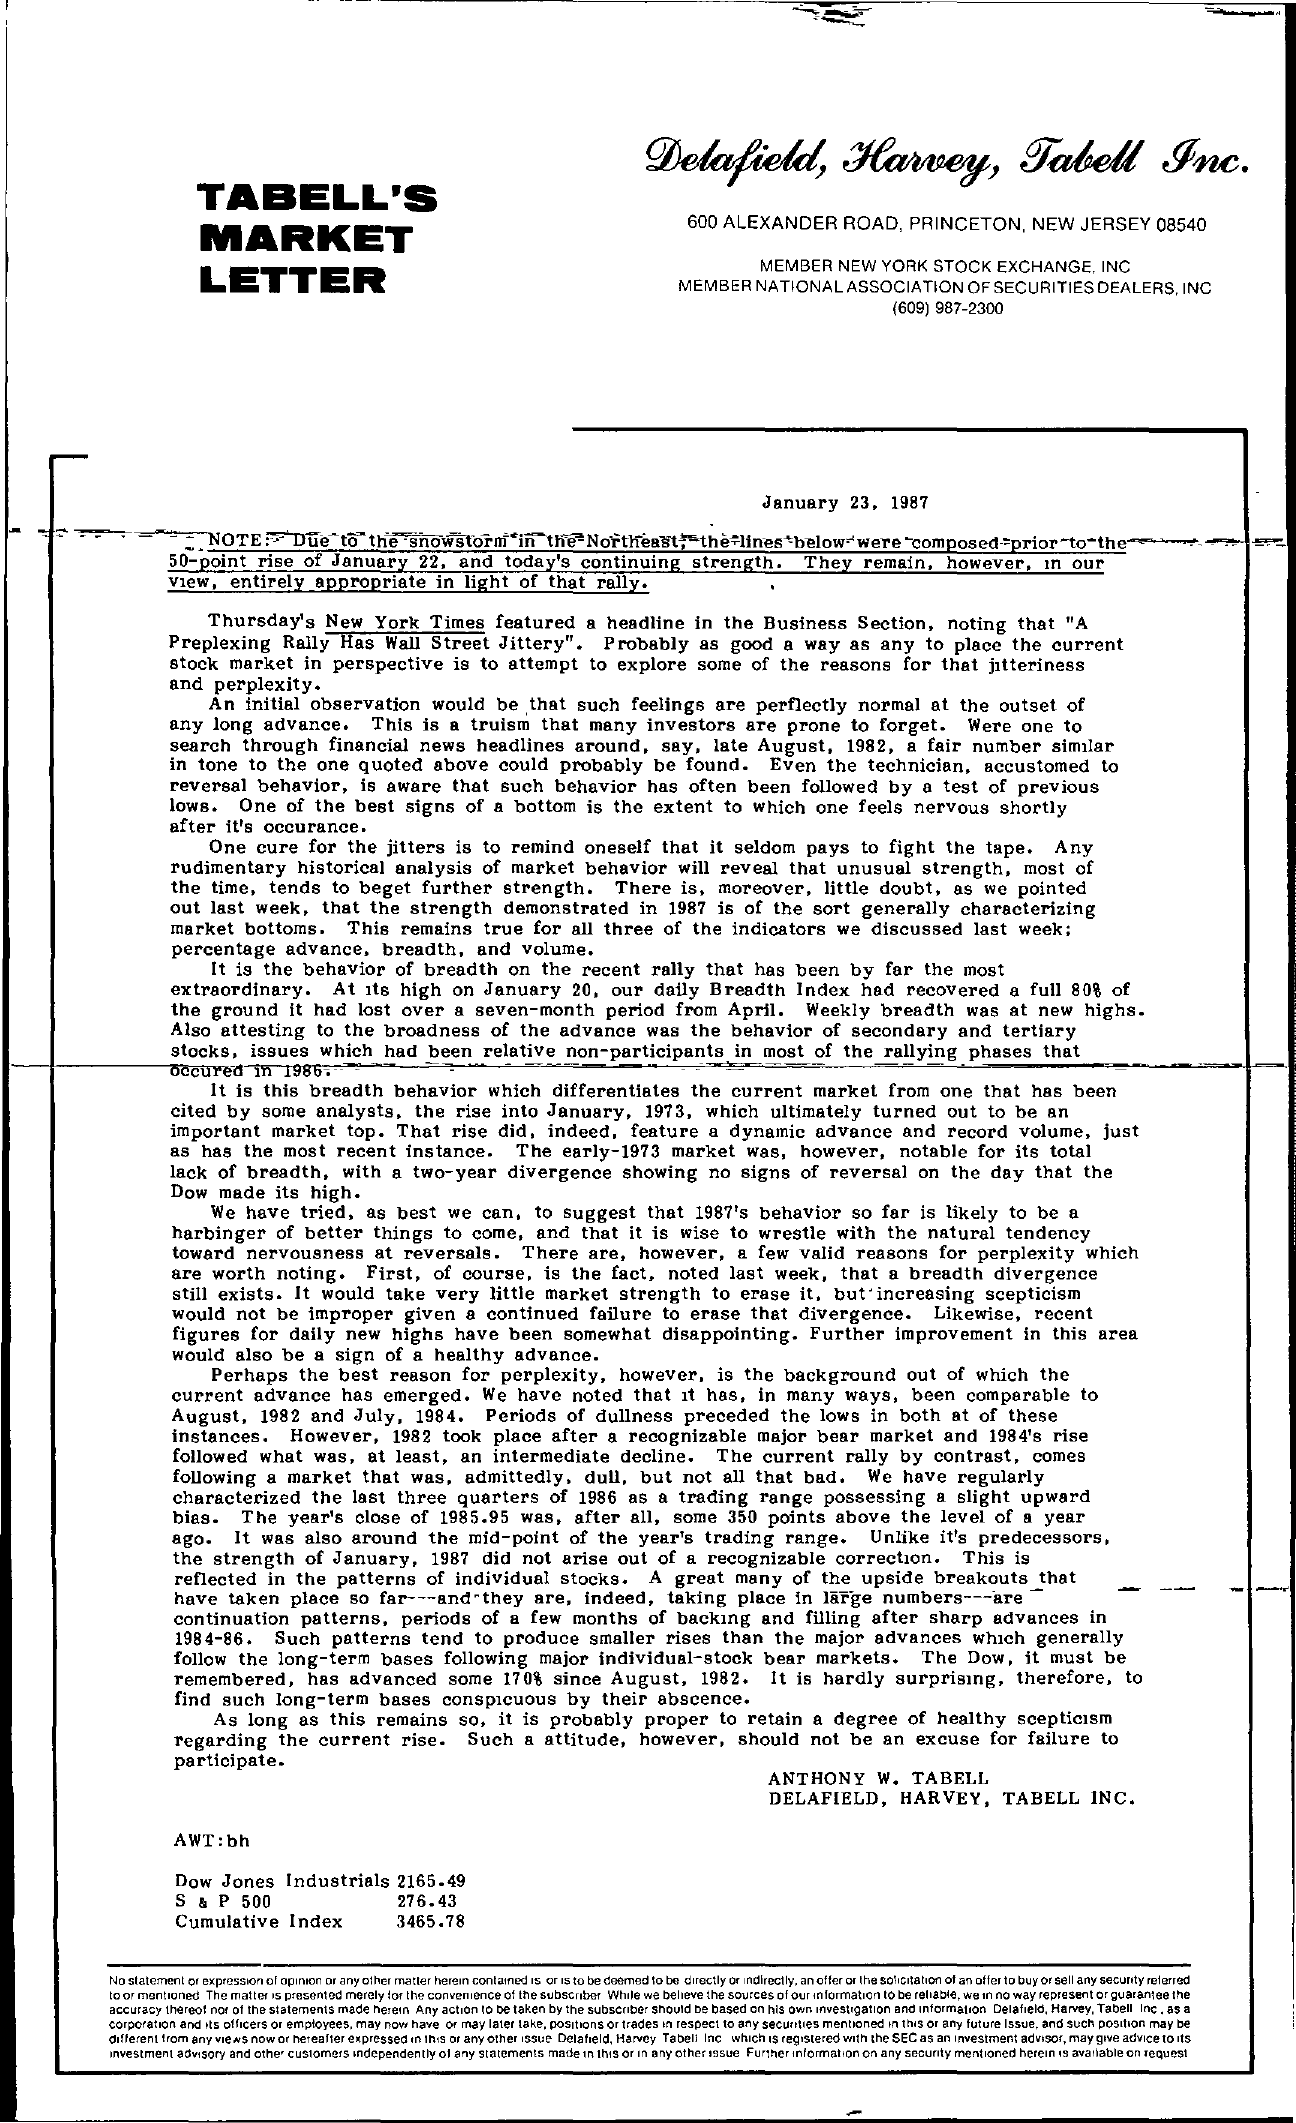 Tabell's Market Letter - January 23, 1987